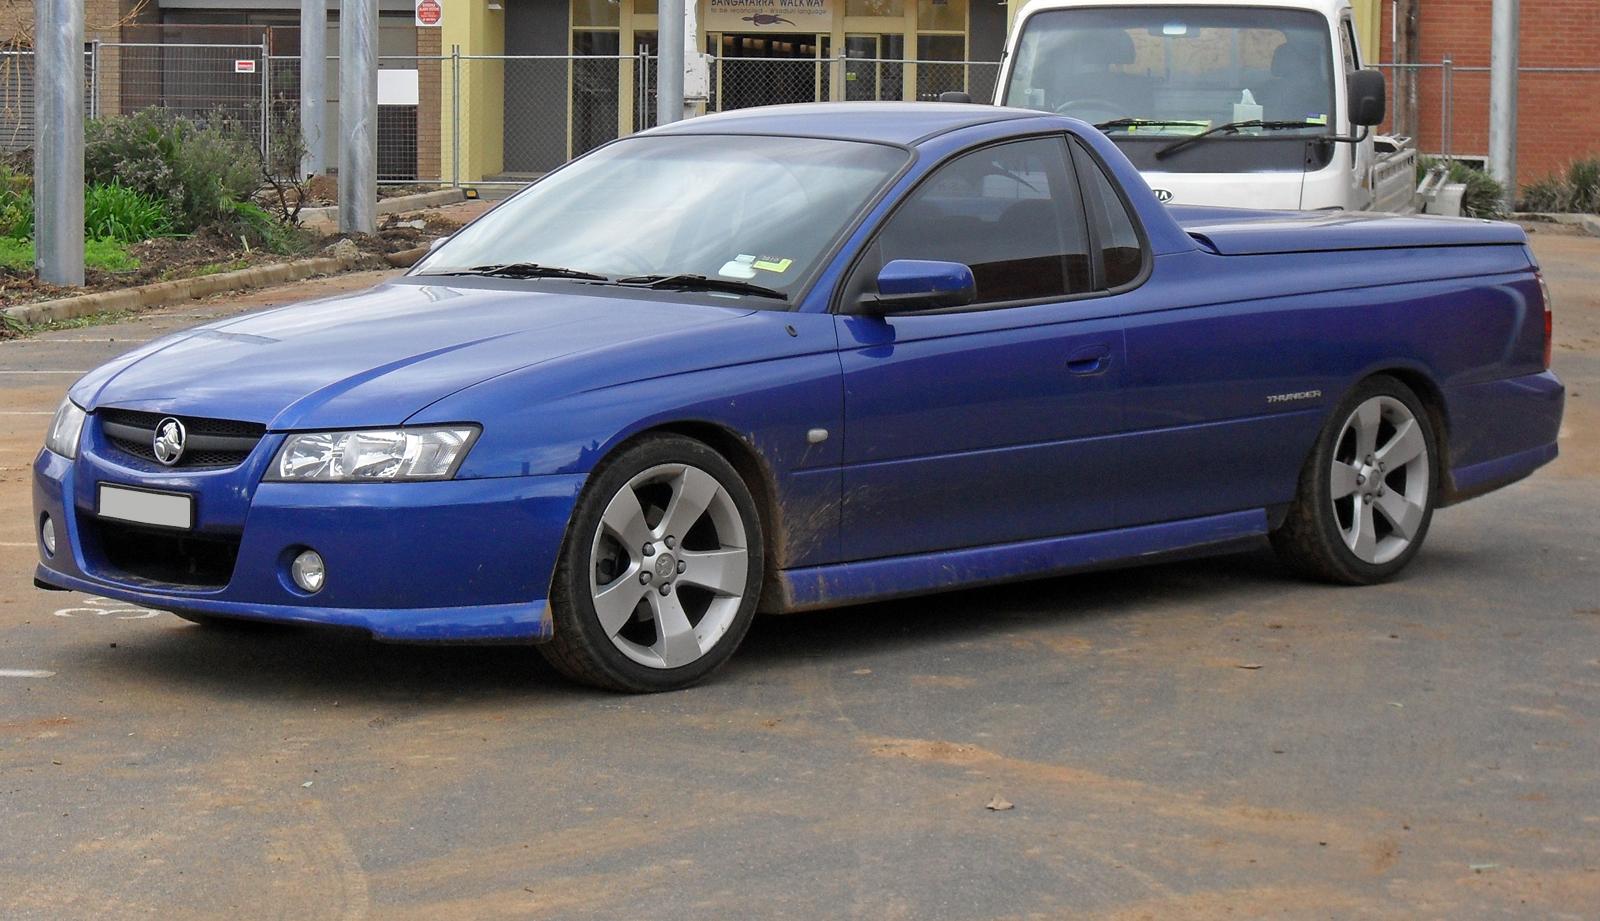 Ute vehicle wikiwand for Holden motor cars australia